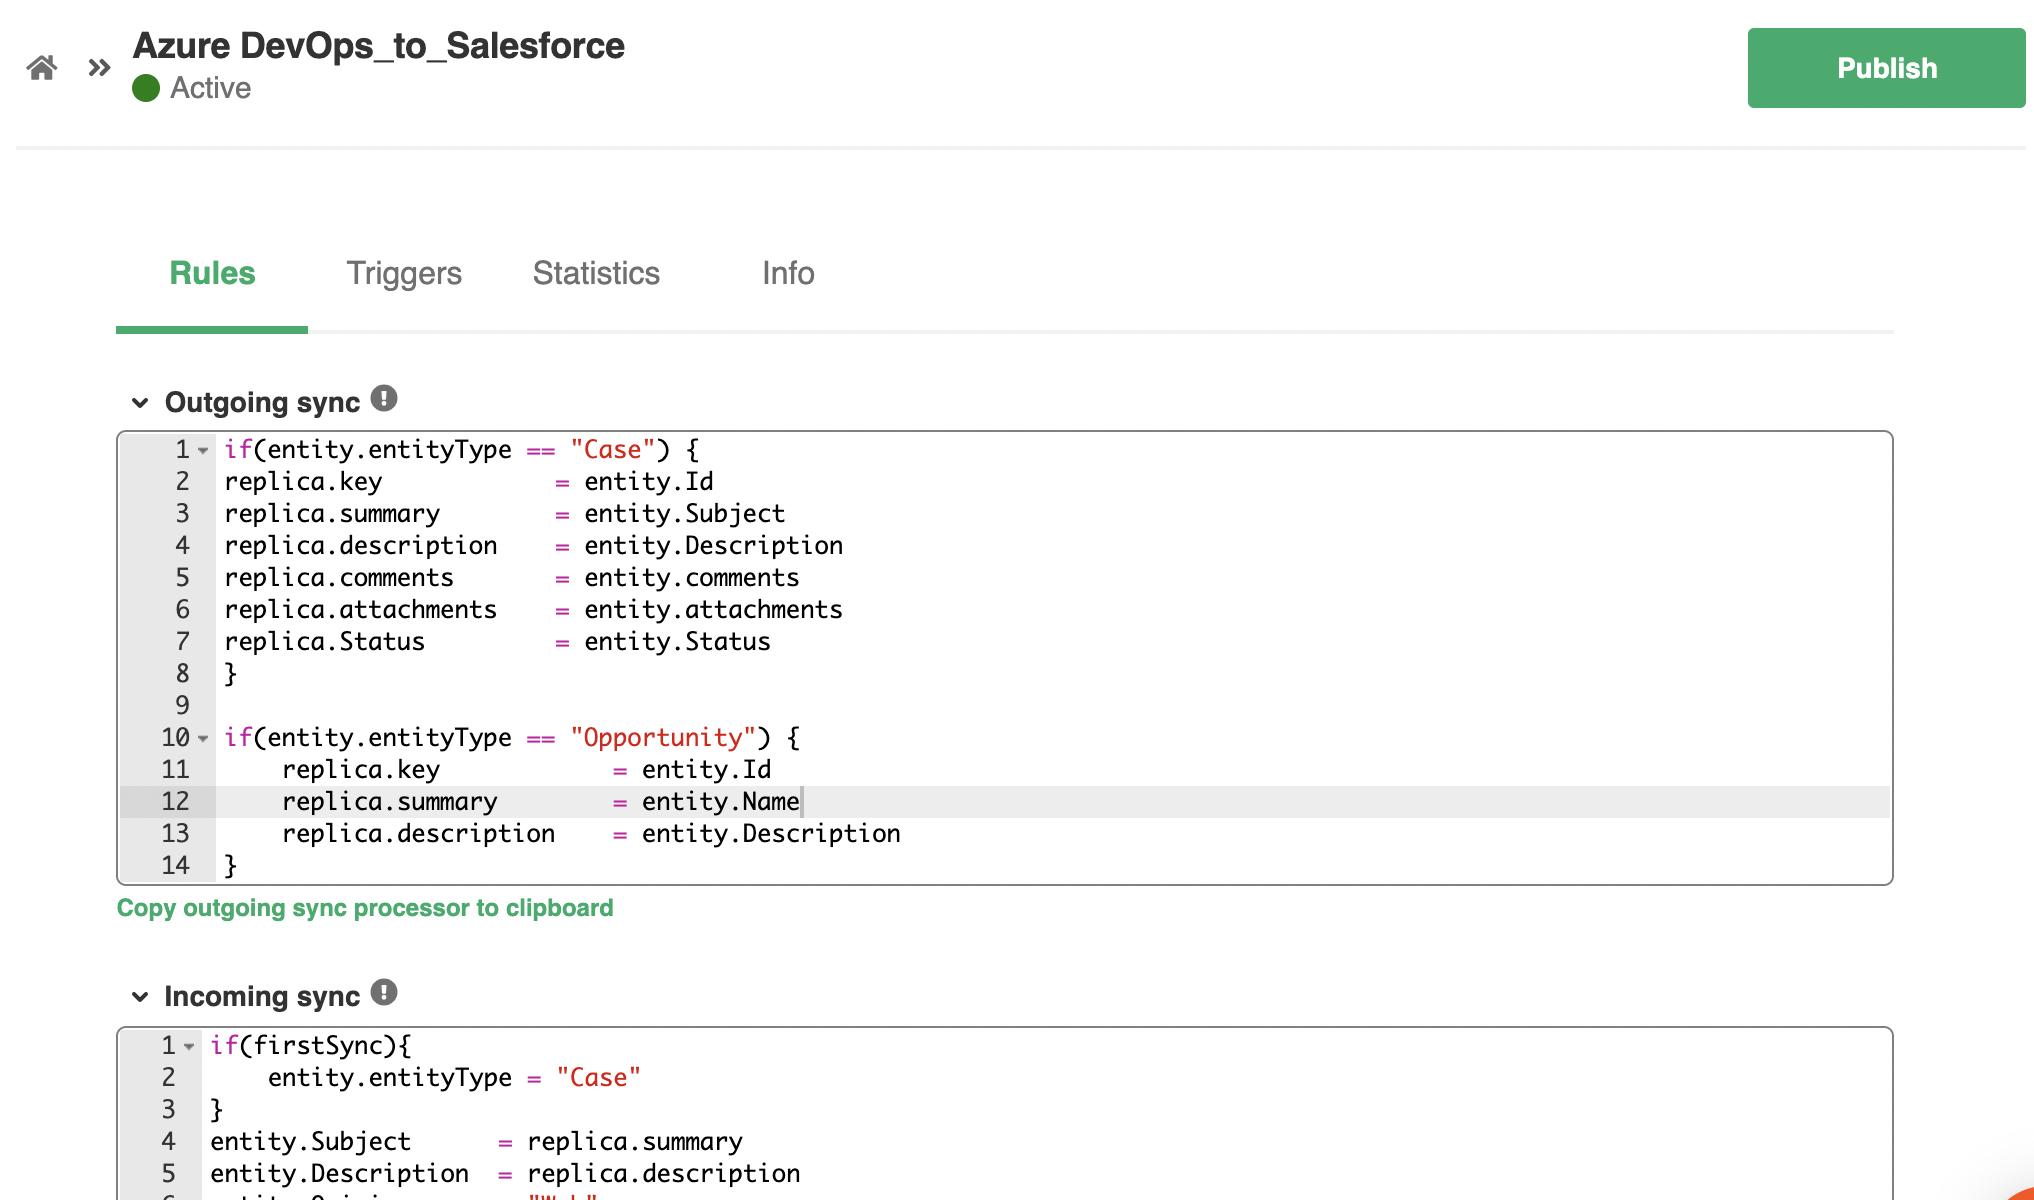 Azure DevOps Salesforce sync rules